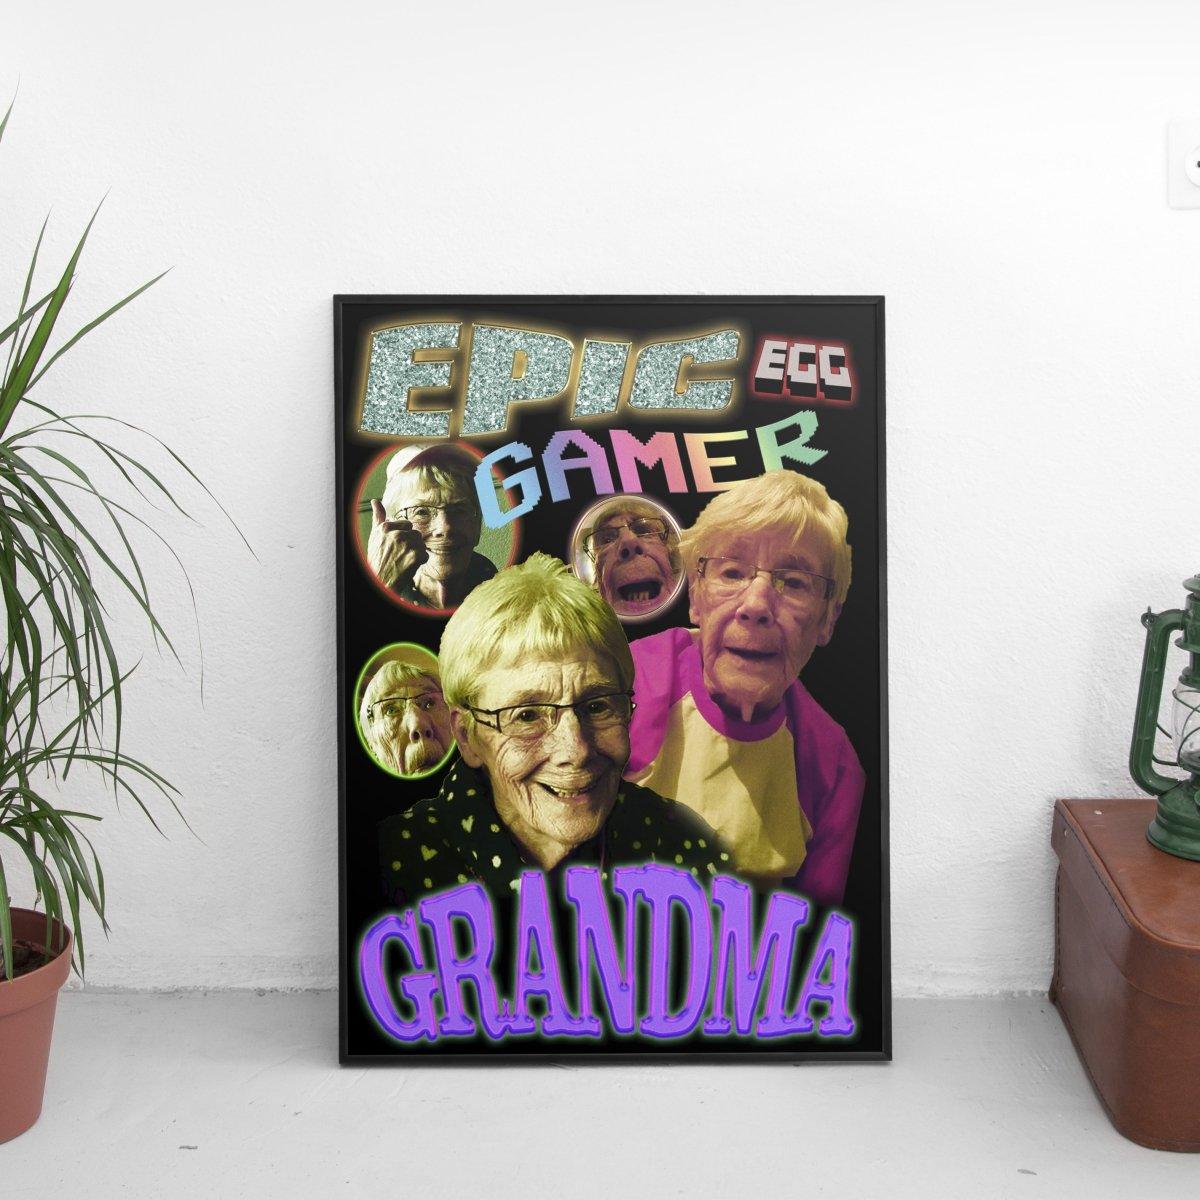 Epic Gamer Grandma - Vintage Poster